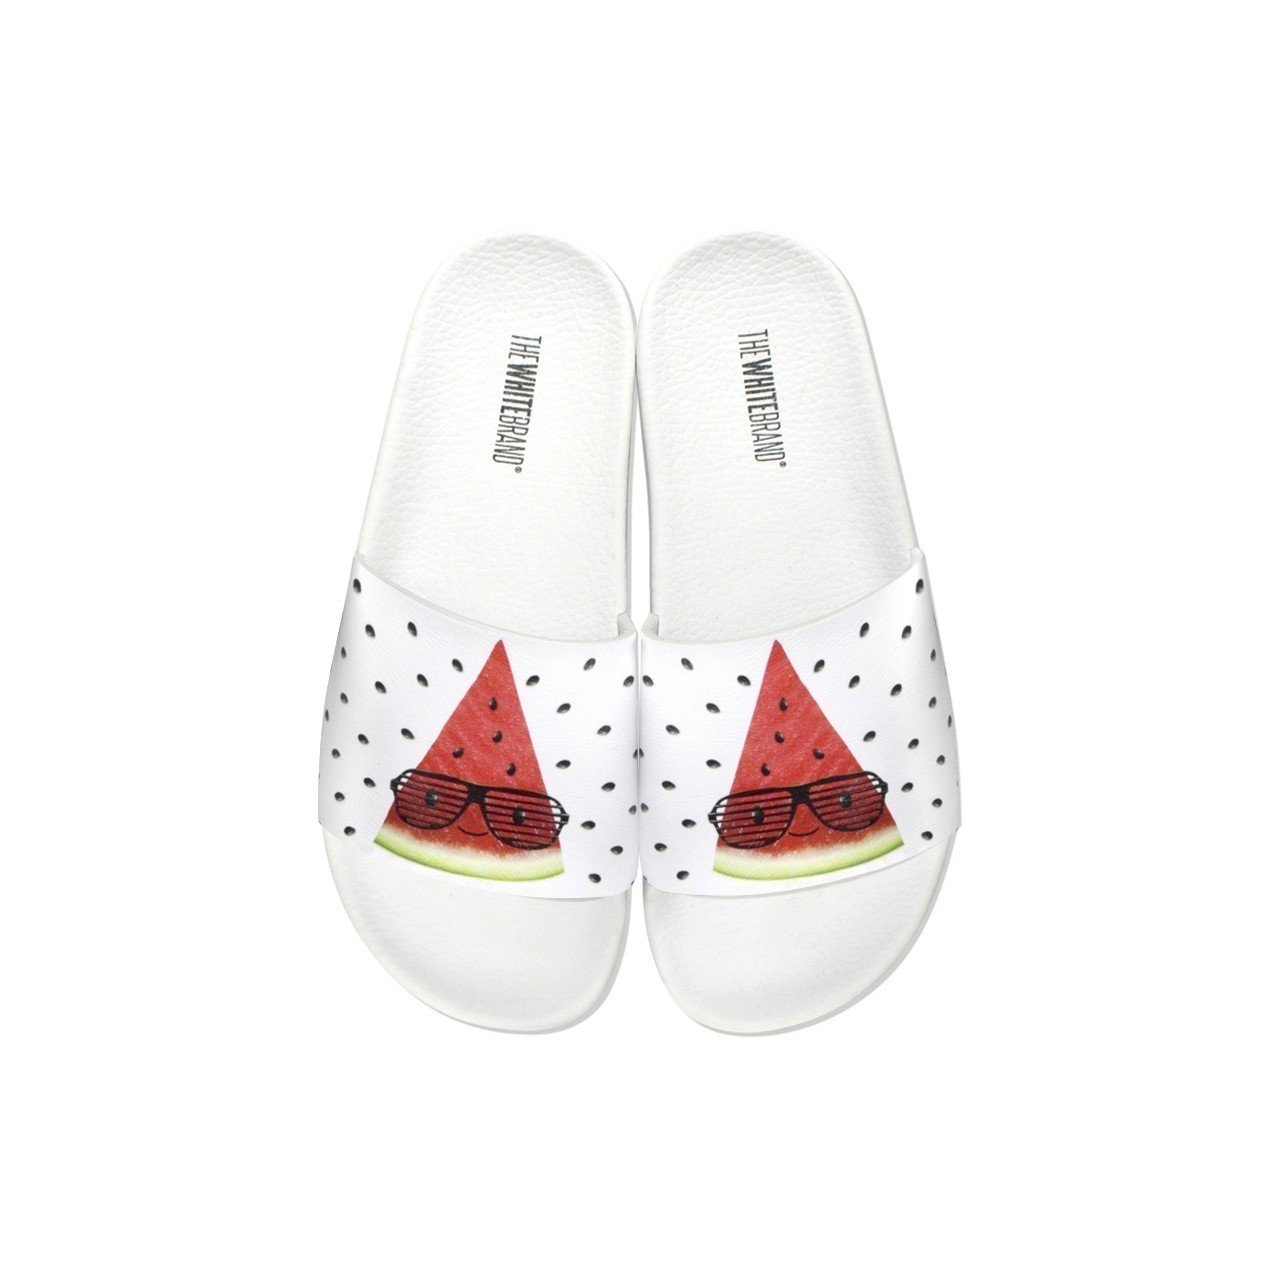 Bílé pantofle The White Brand - Afterwater! - 36